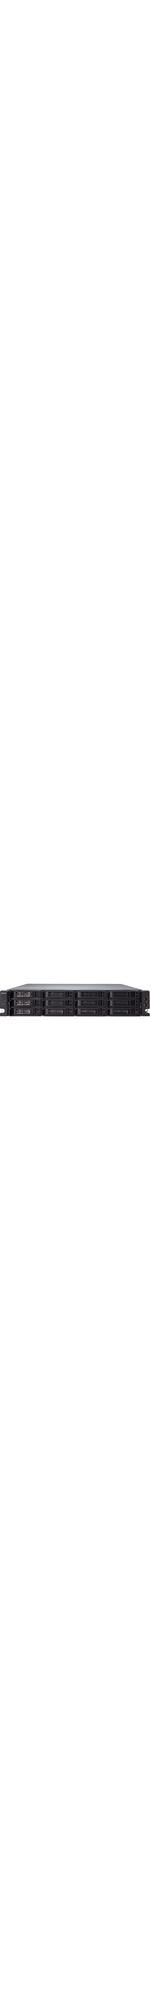 Buffalo TeraStation TS-2RZS12T04D 12 x Total Bays Network Storage Server - 2U - Rack-mountable